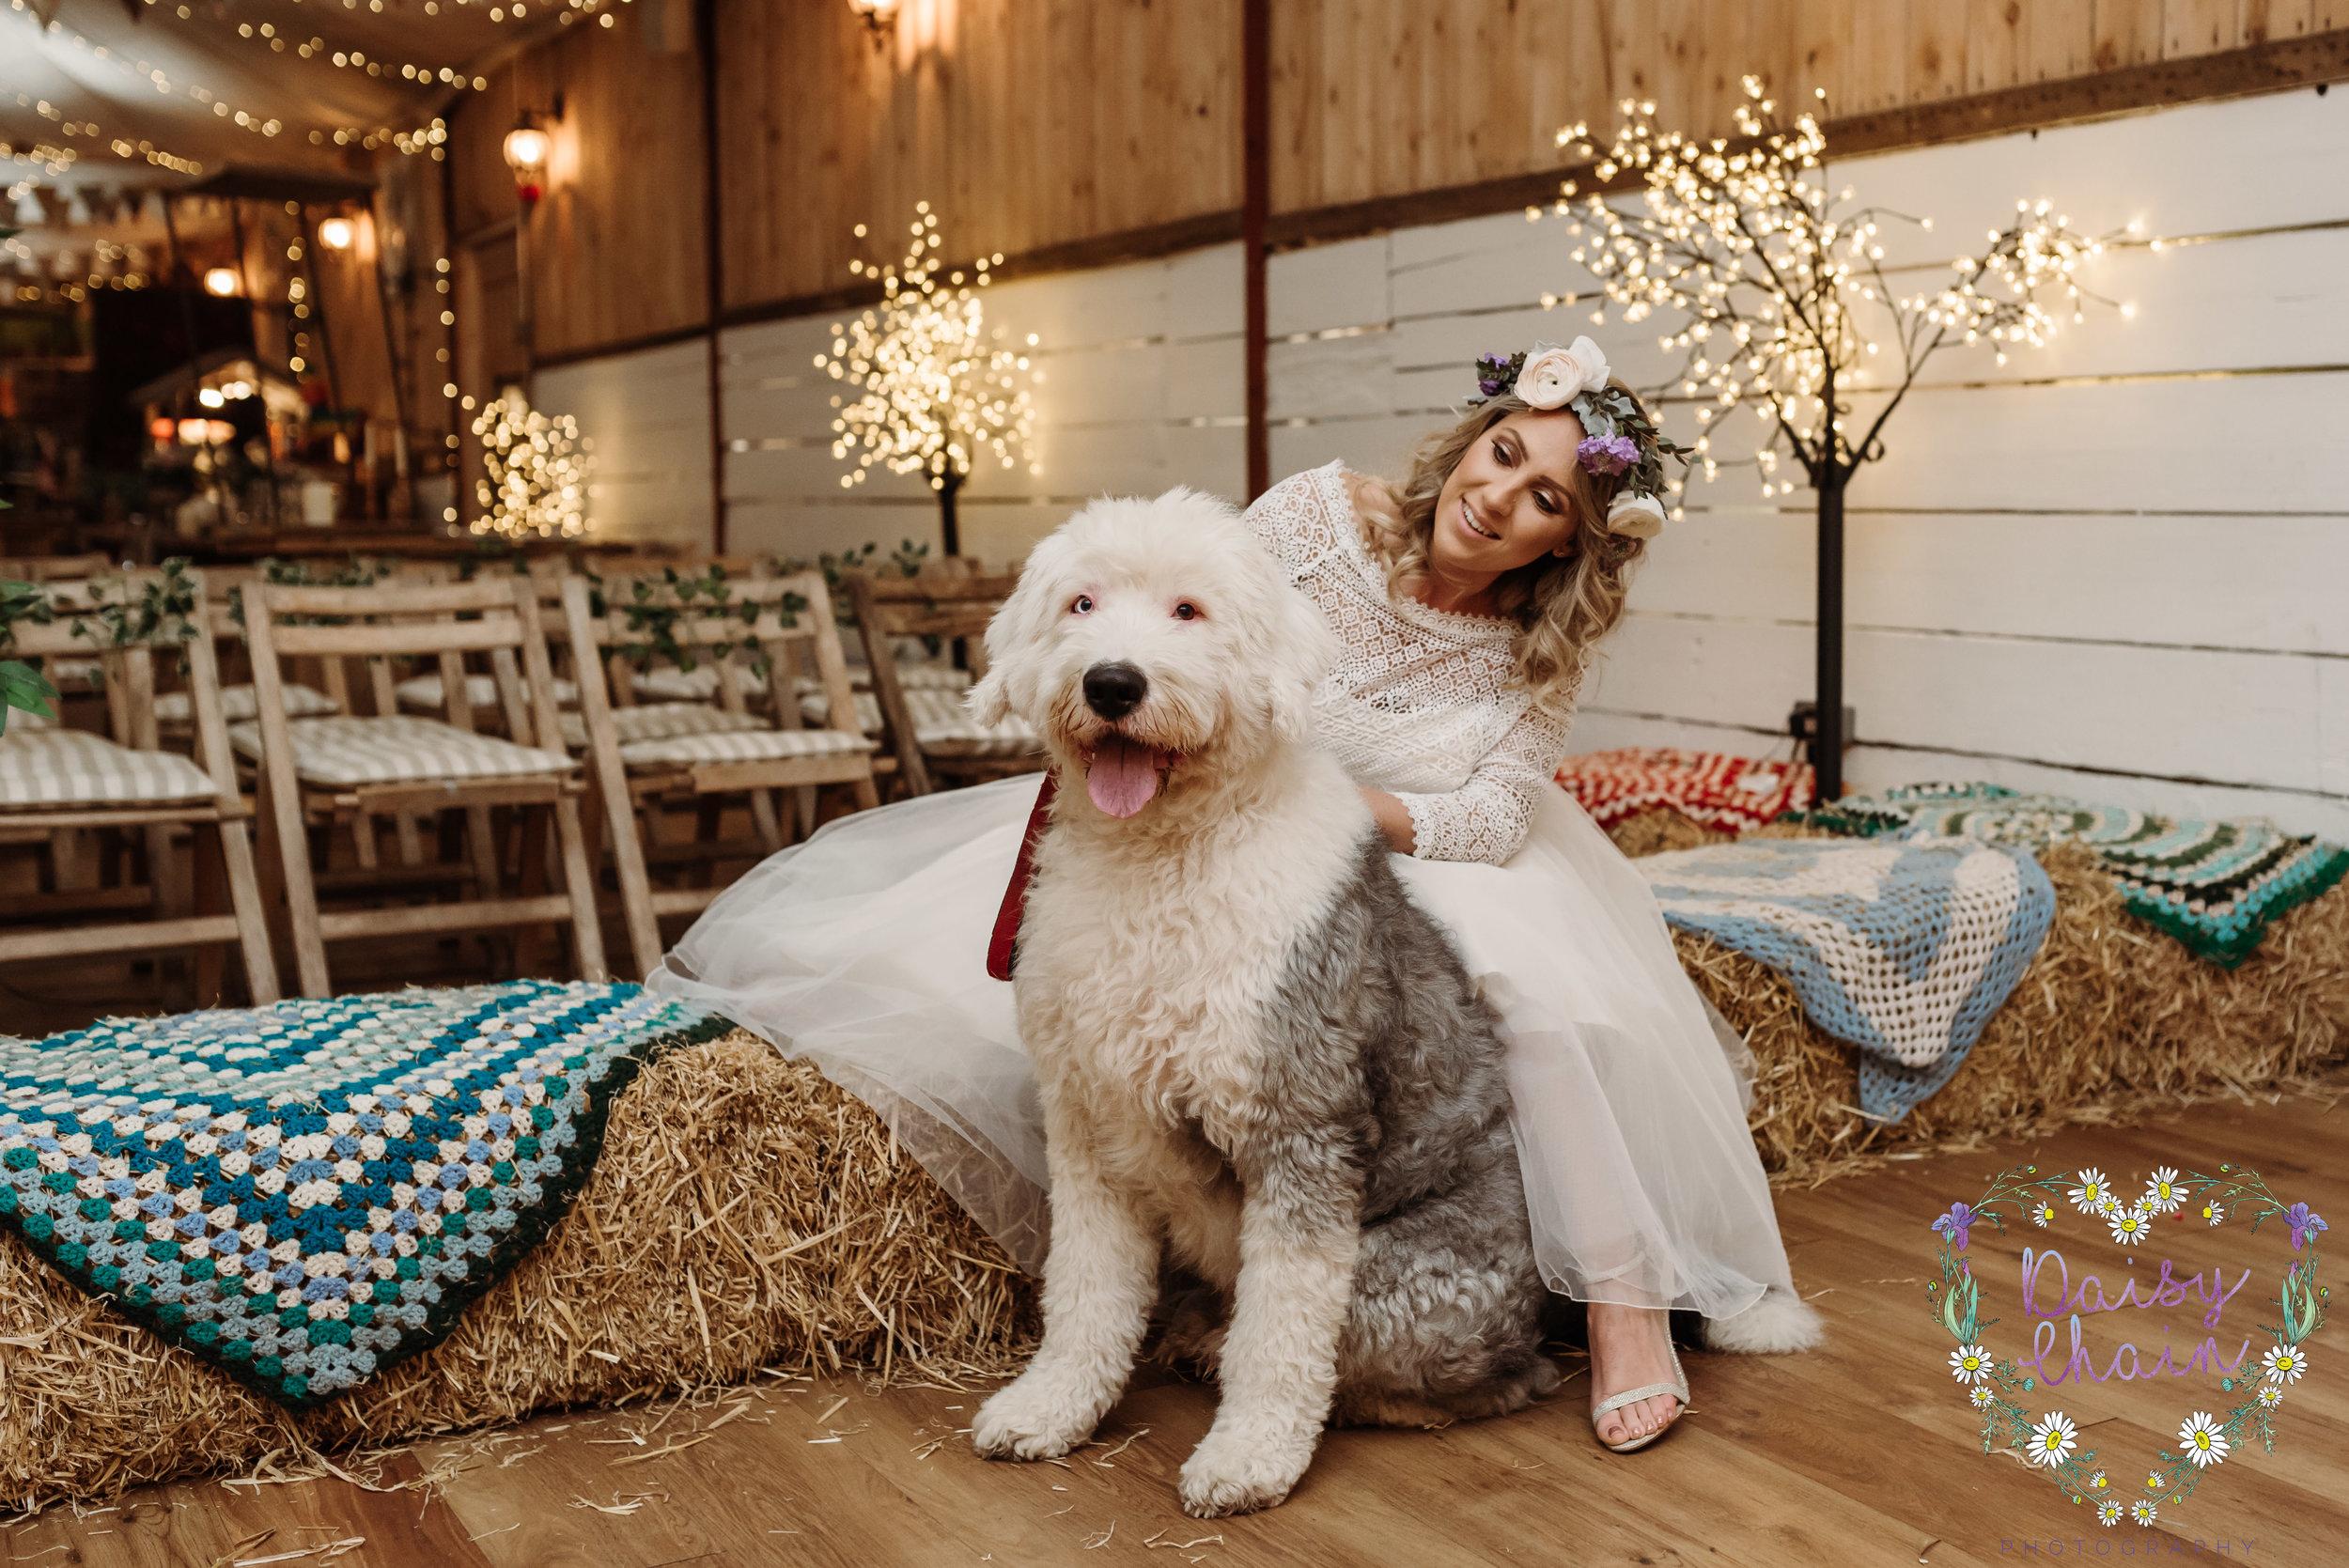 Dogs at weddings - old english sheepdog